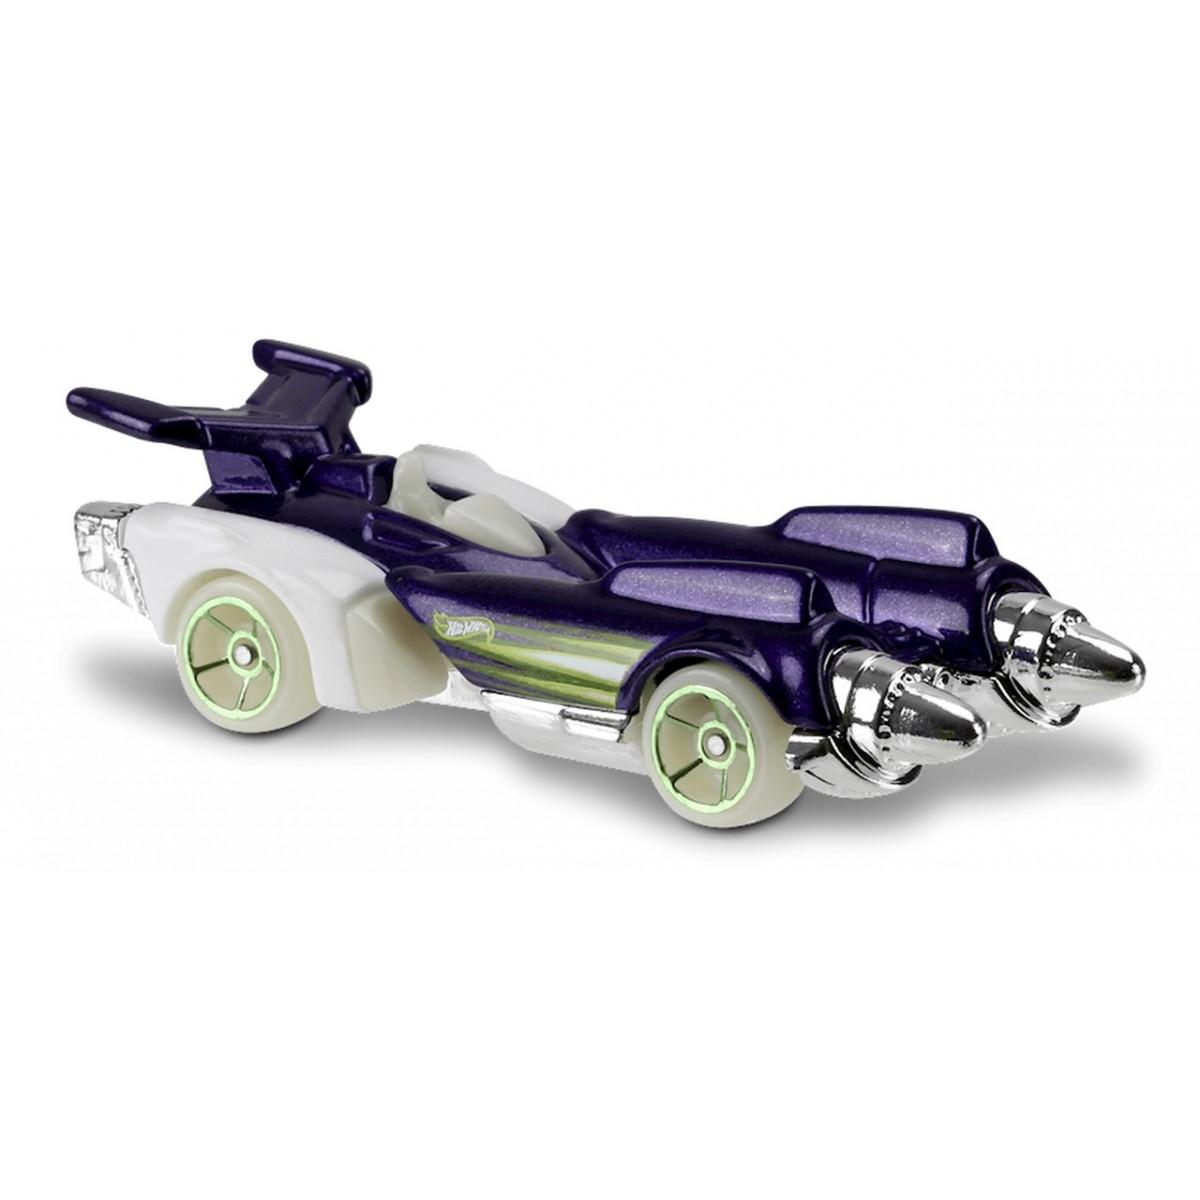 Carrinho Hot Wheels: Ollie Rocket Roxo